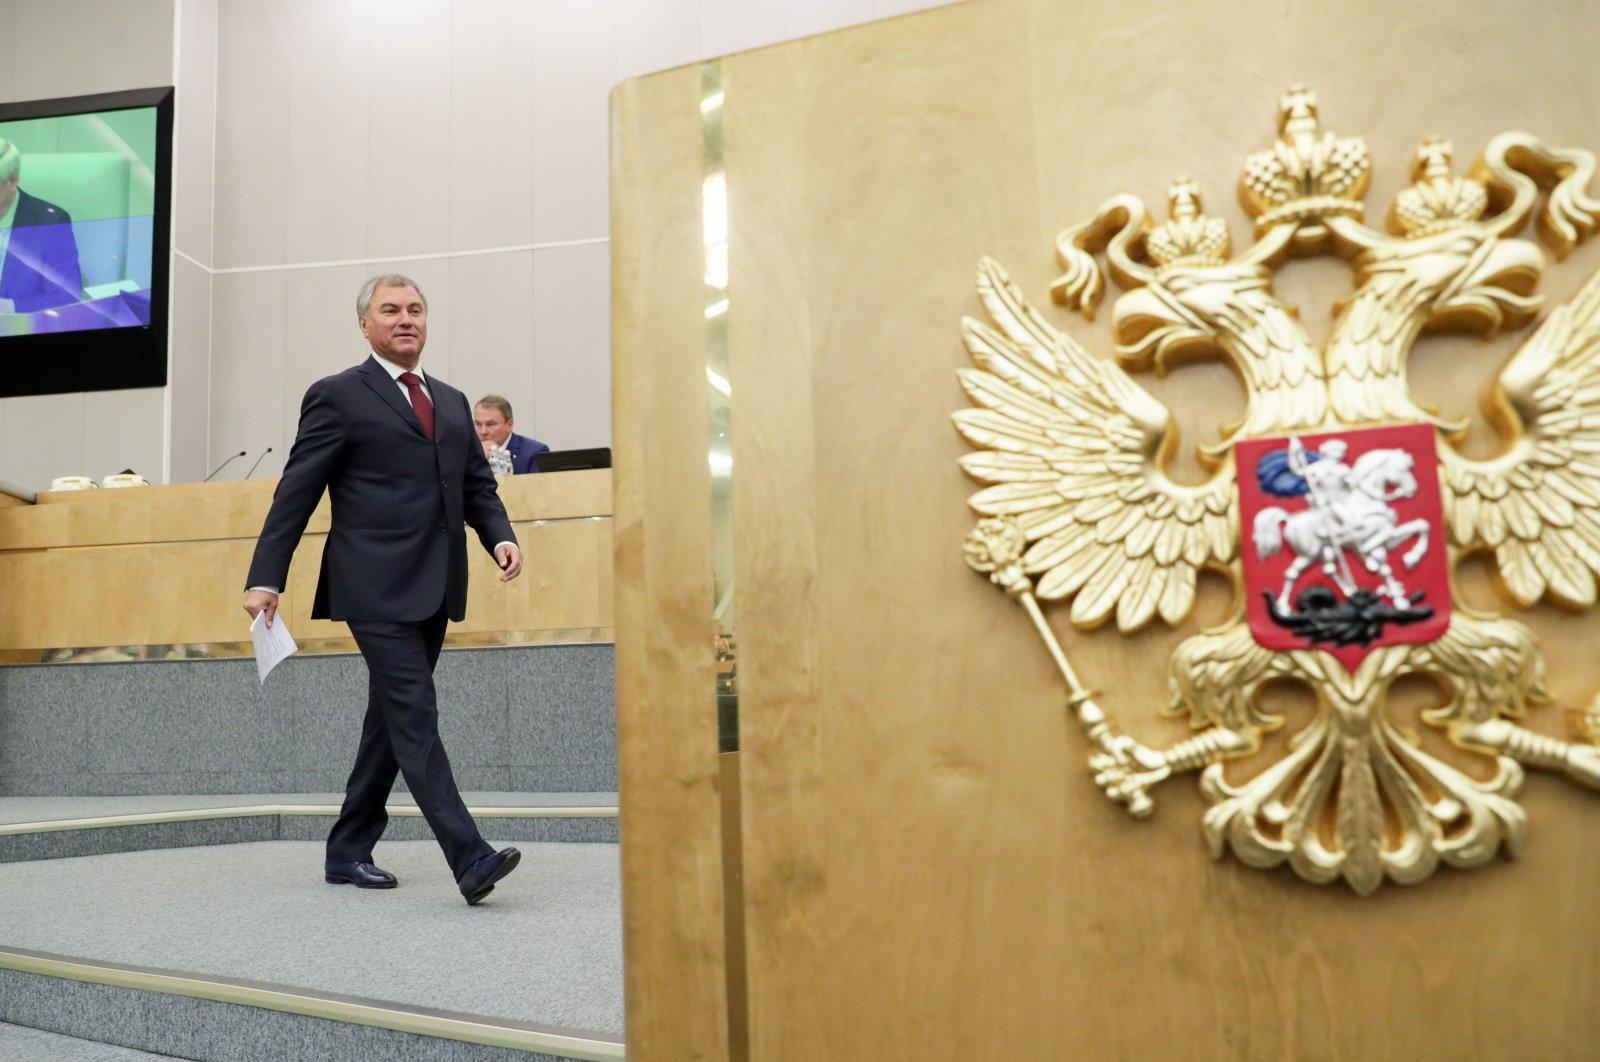 Russia's State Duma Speaker Vyacheslav Volodin walks toward the tribune to address deputies, Moscow, Sept. 15, 2020. (AFP Photo)